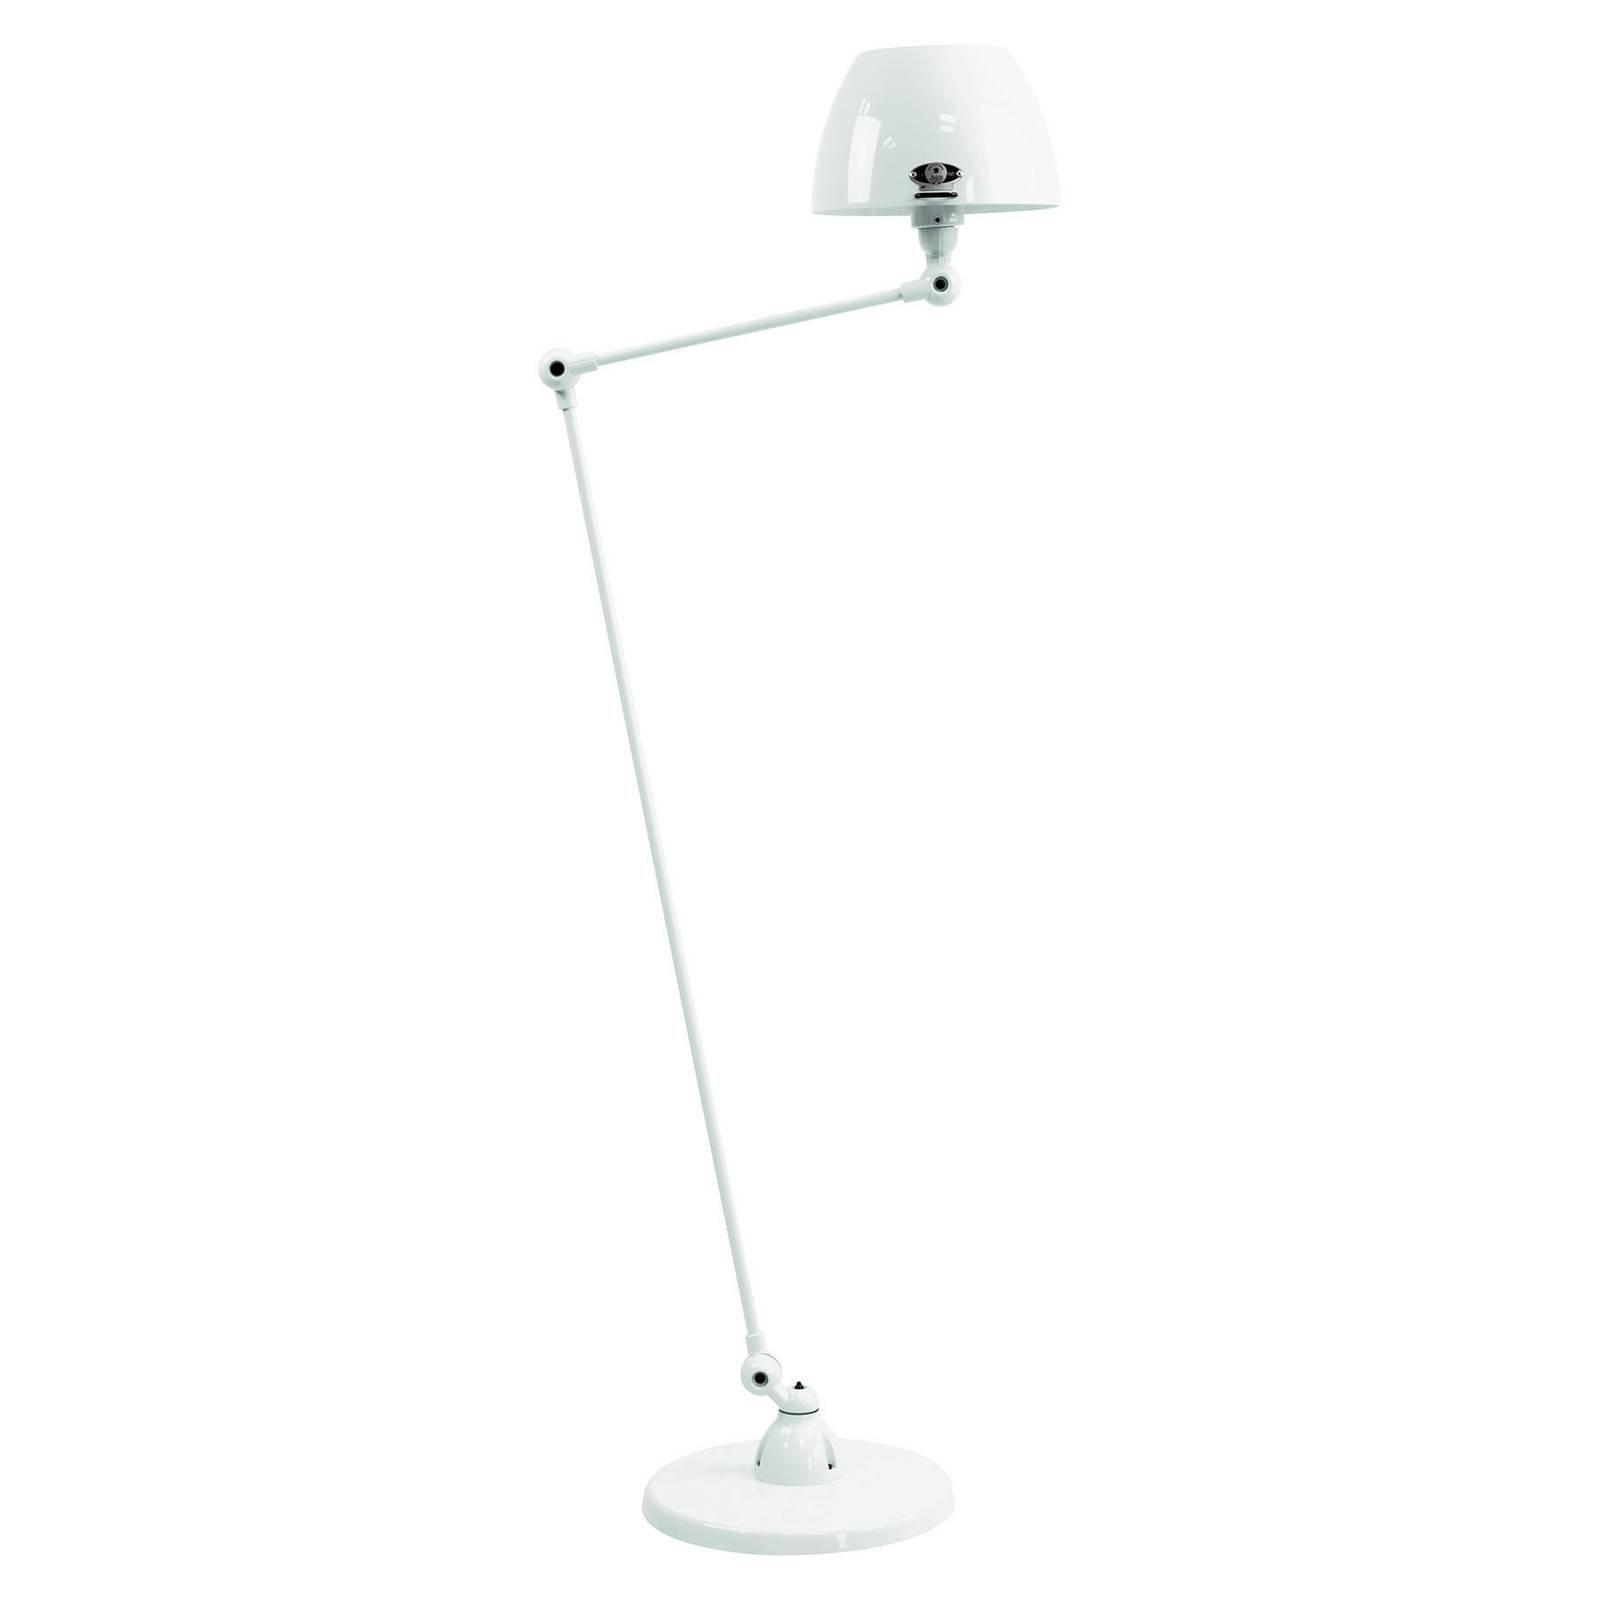 Jieldé Aicler AIC833 gulvlampe, 80+30 cm, hvit